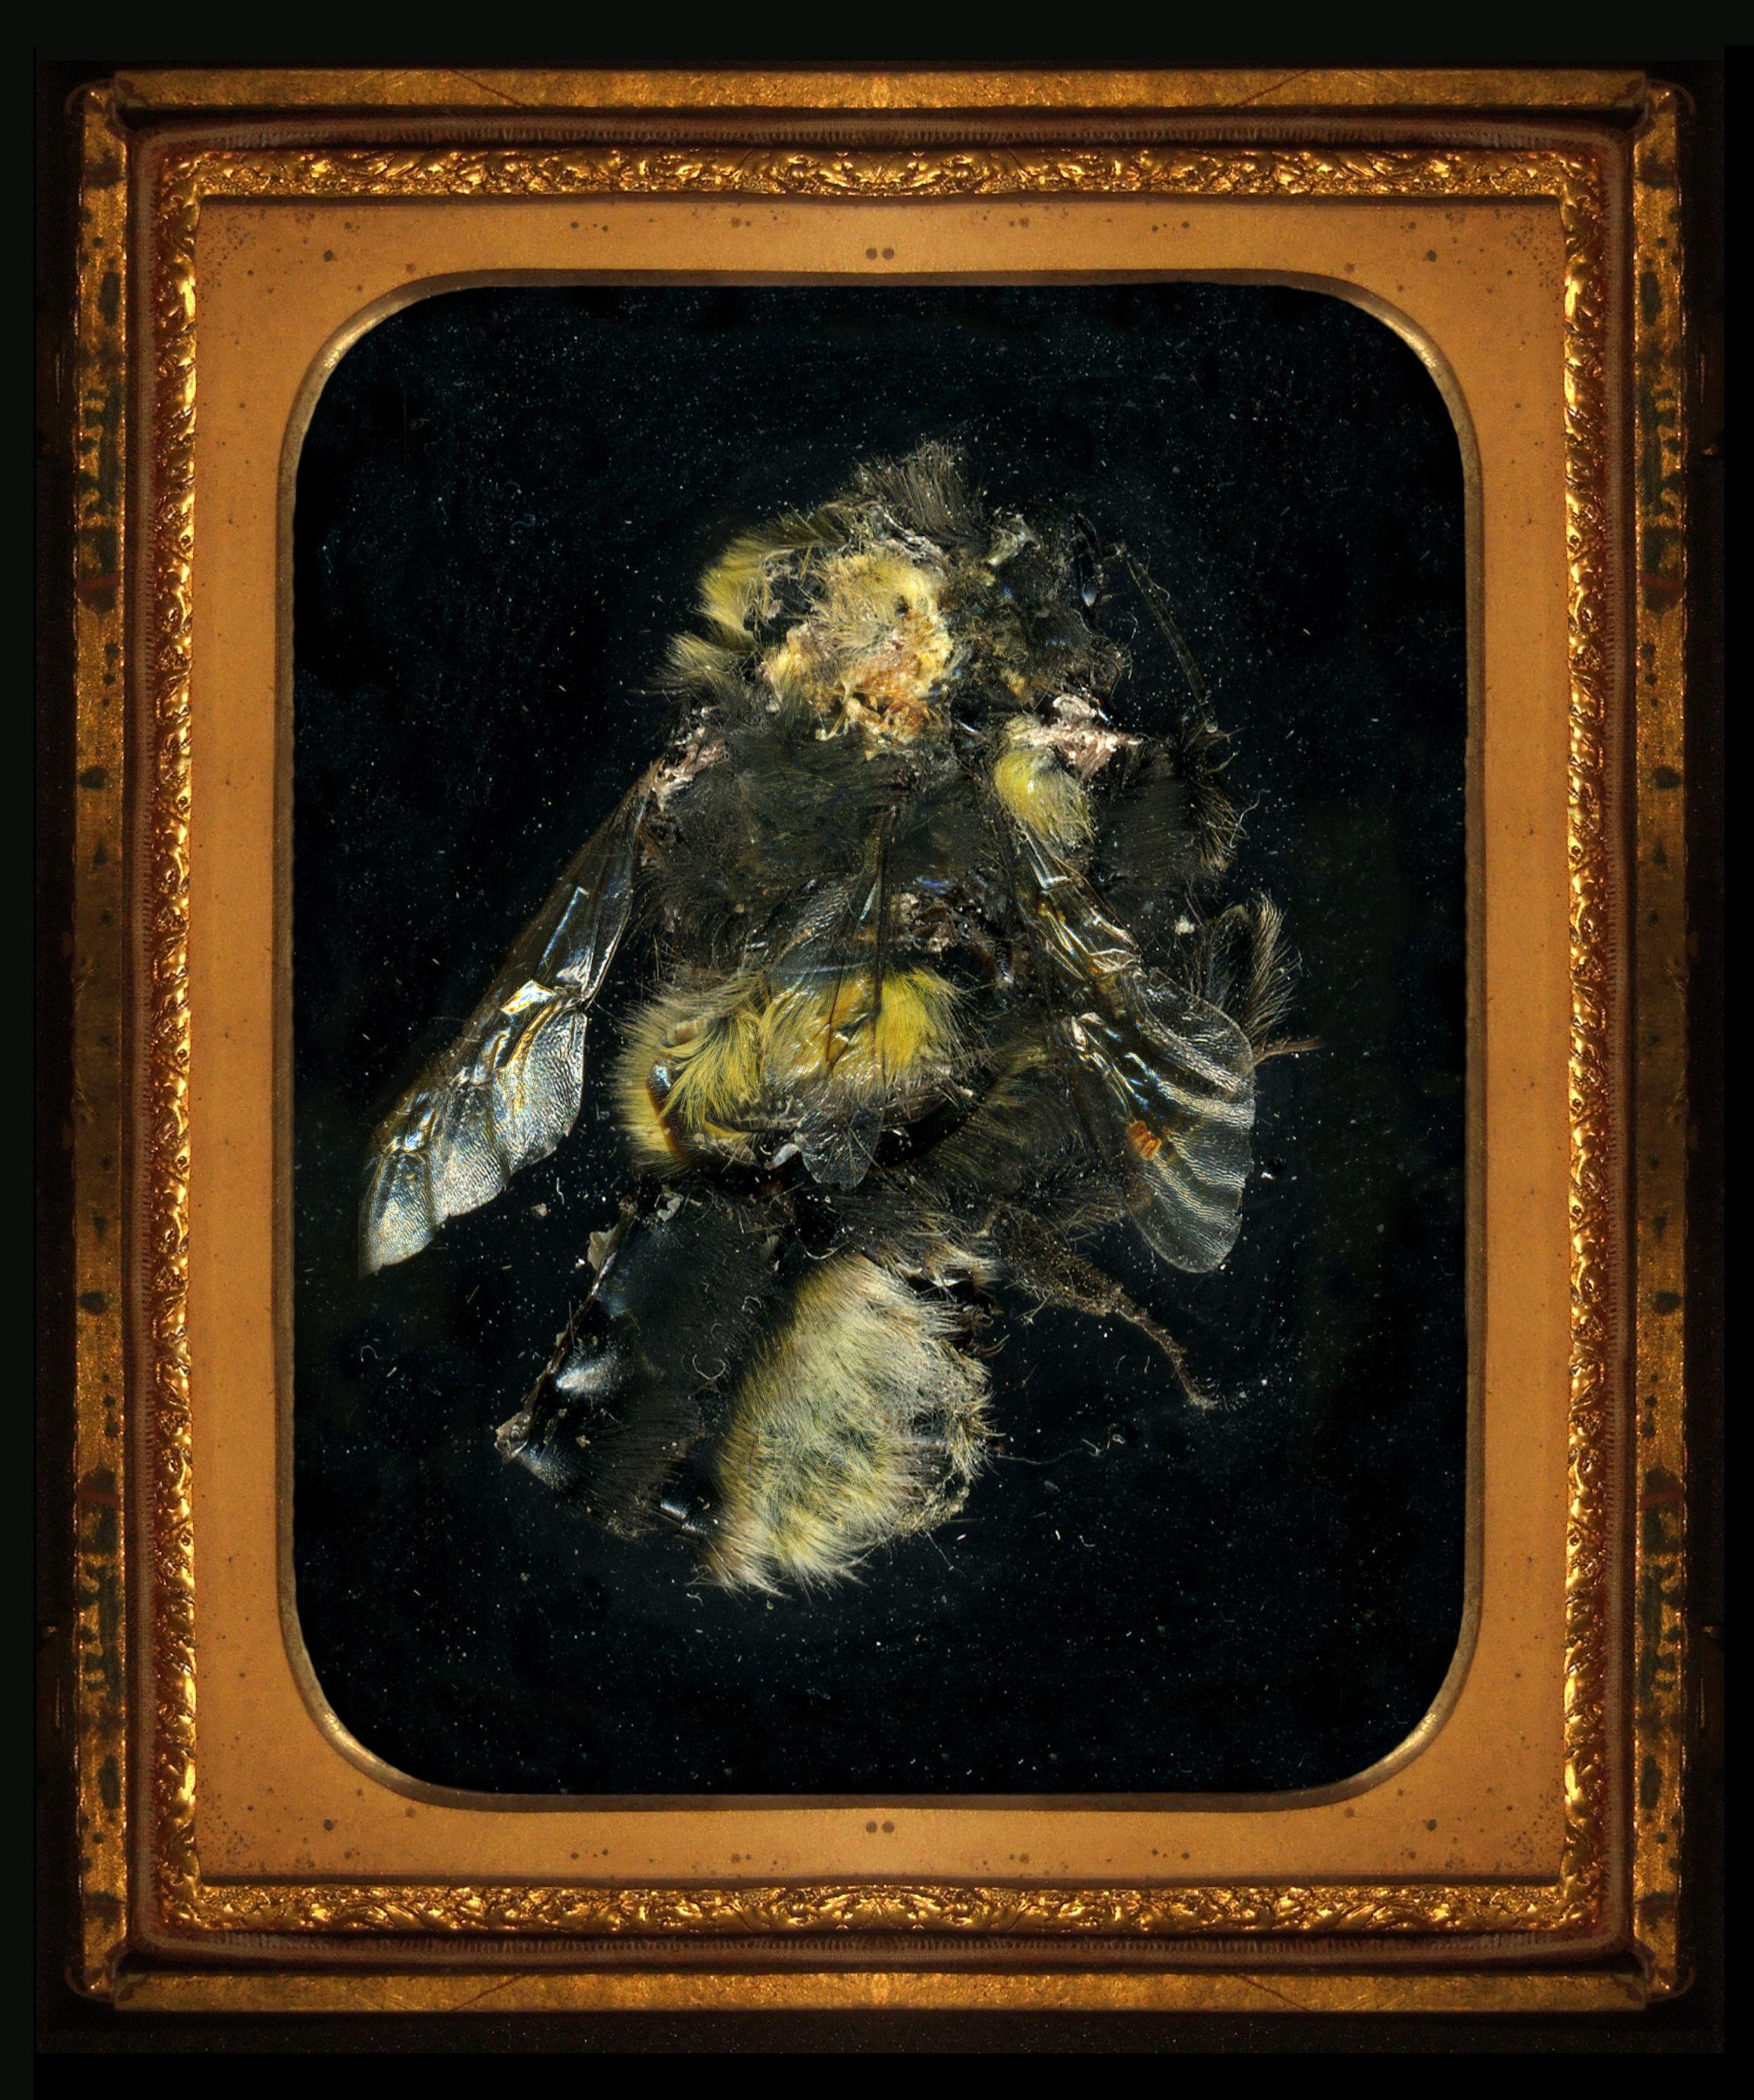 Matt Collishaw | art, curiosities, oddities, insects, entomology, memento mori